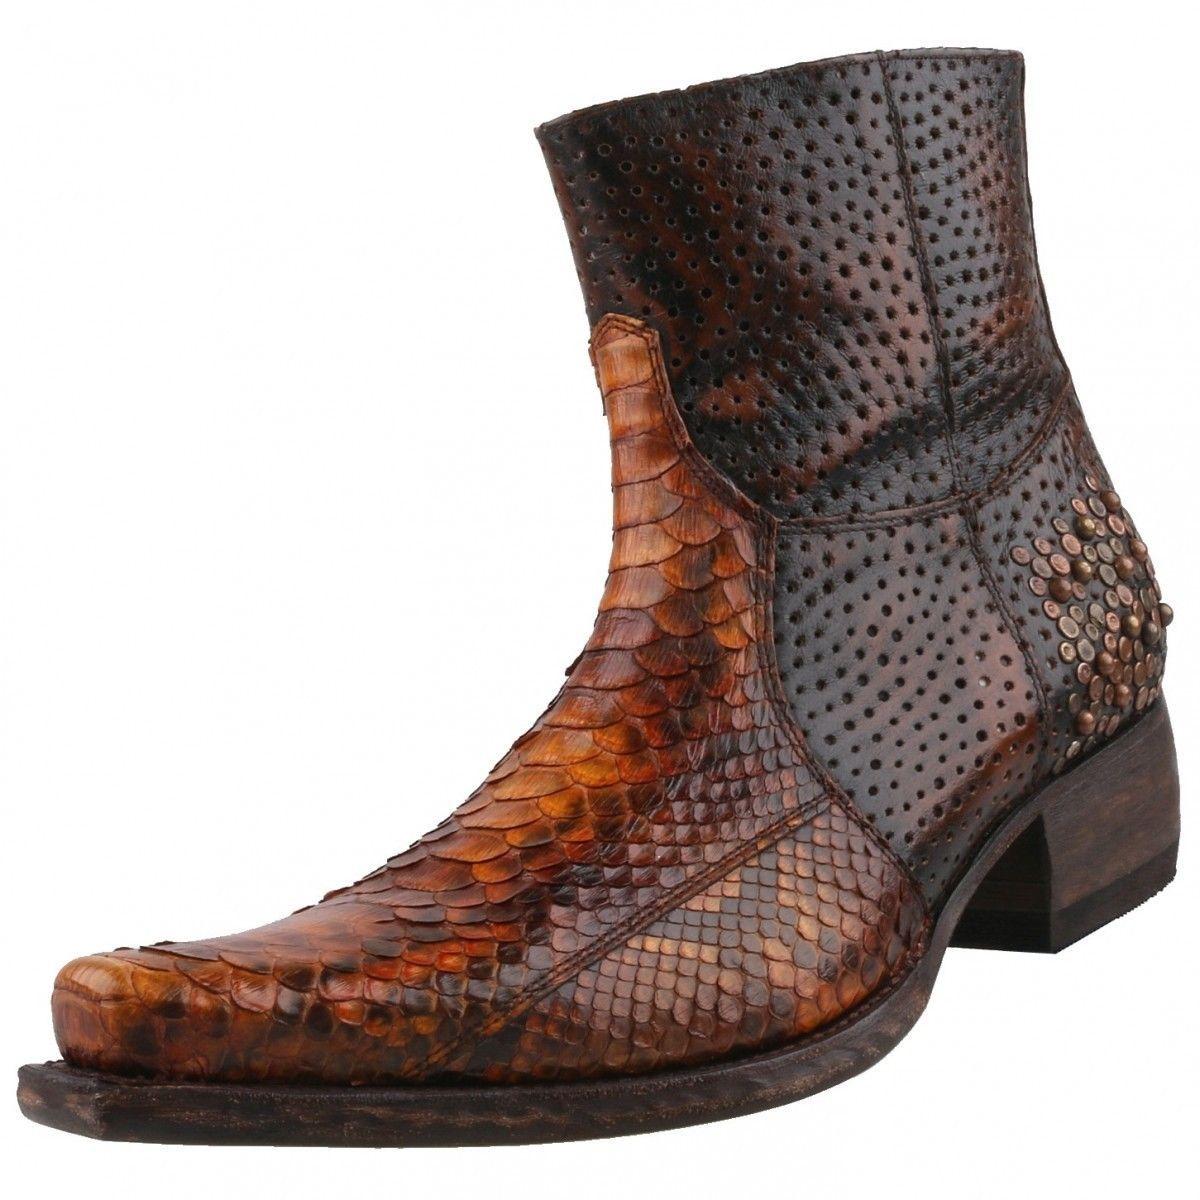 NEUF sendra Boots Chaussures Hommes Bottes Bottines Hommes Bottes Bottes en cuir